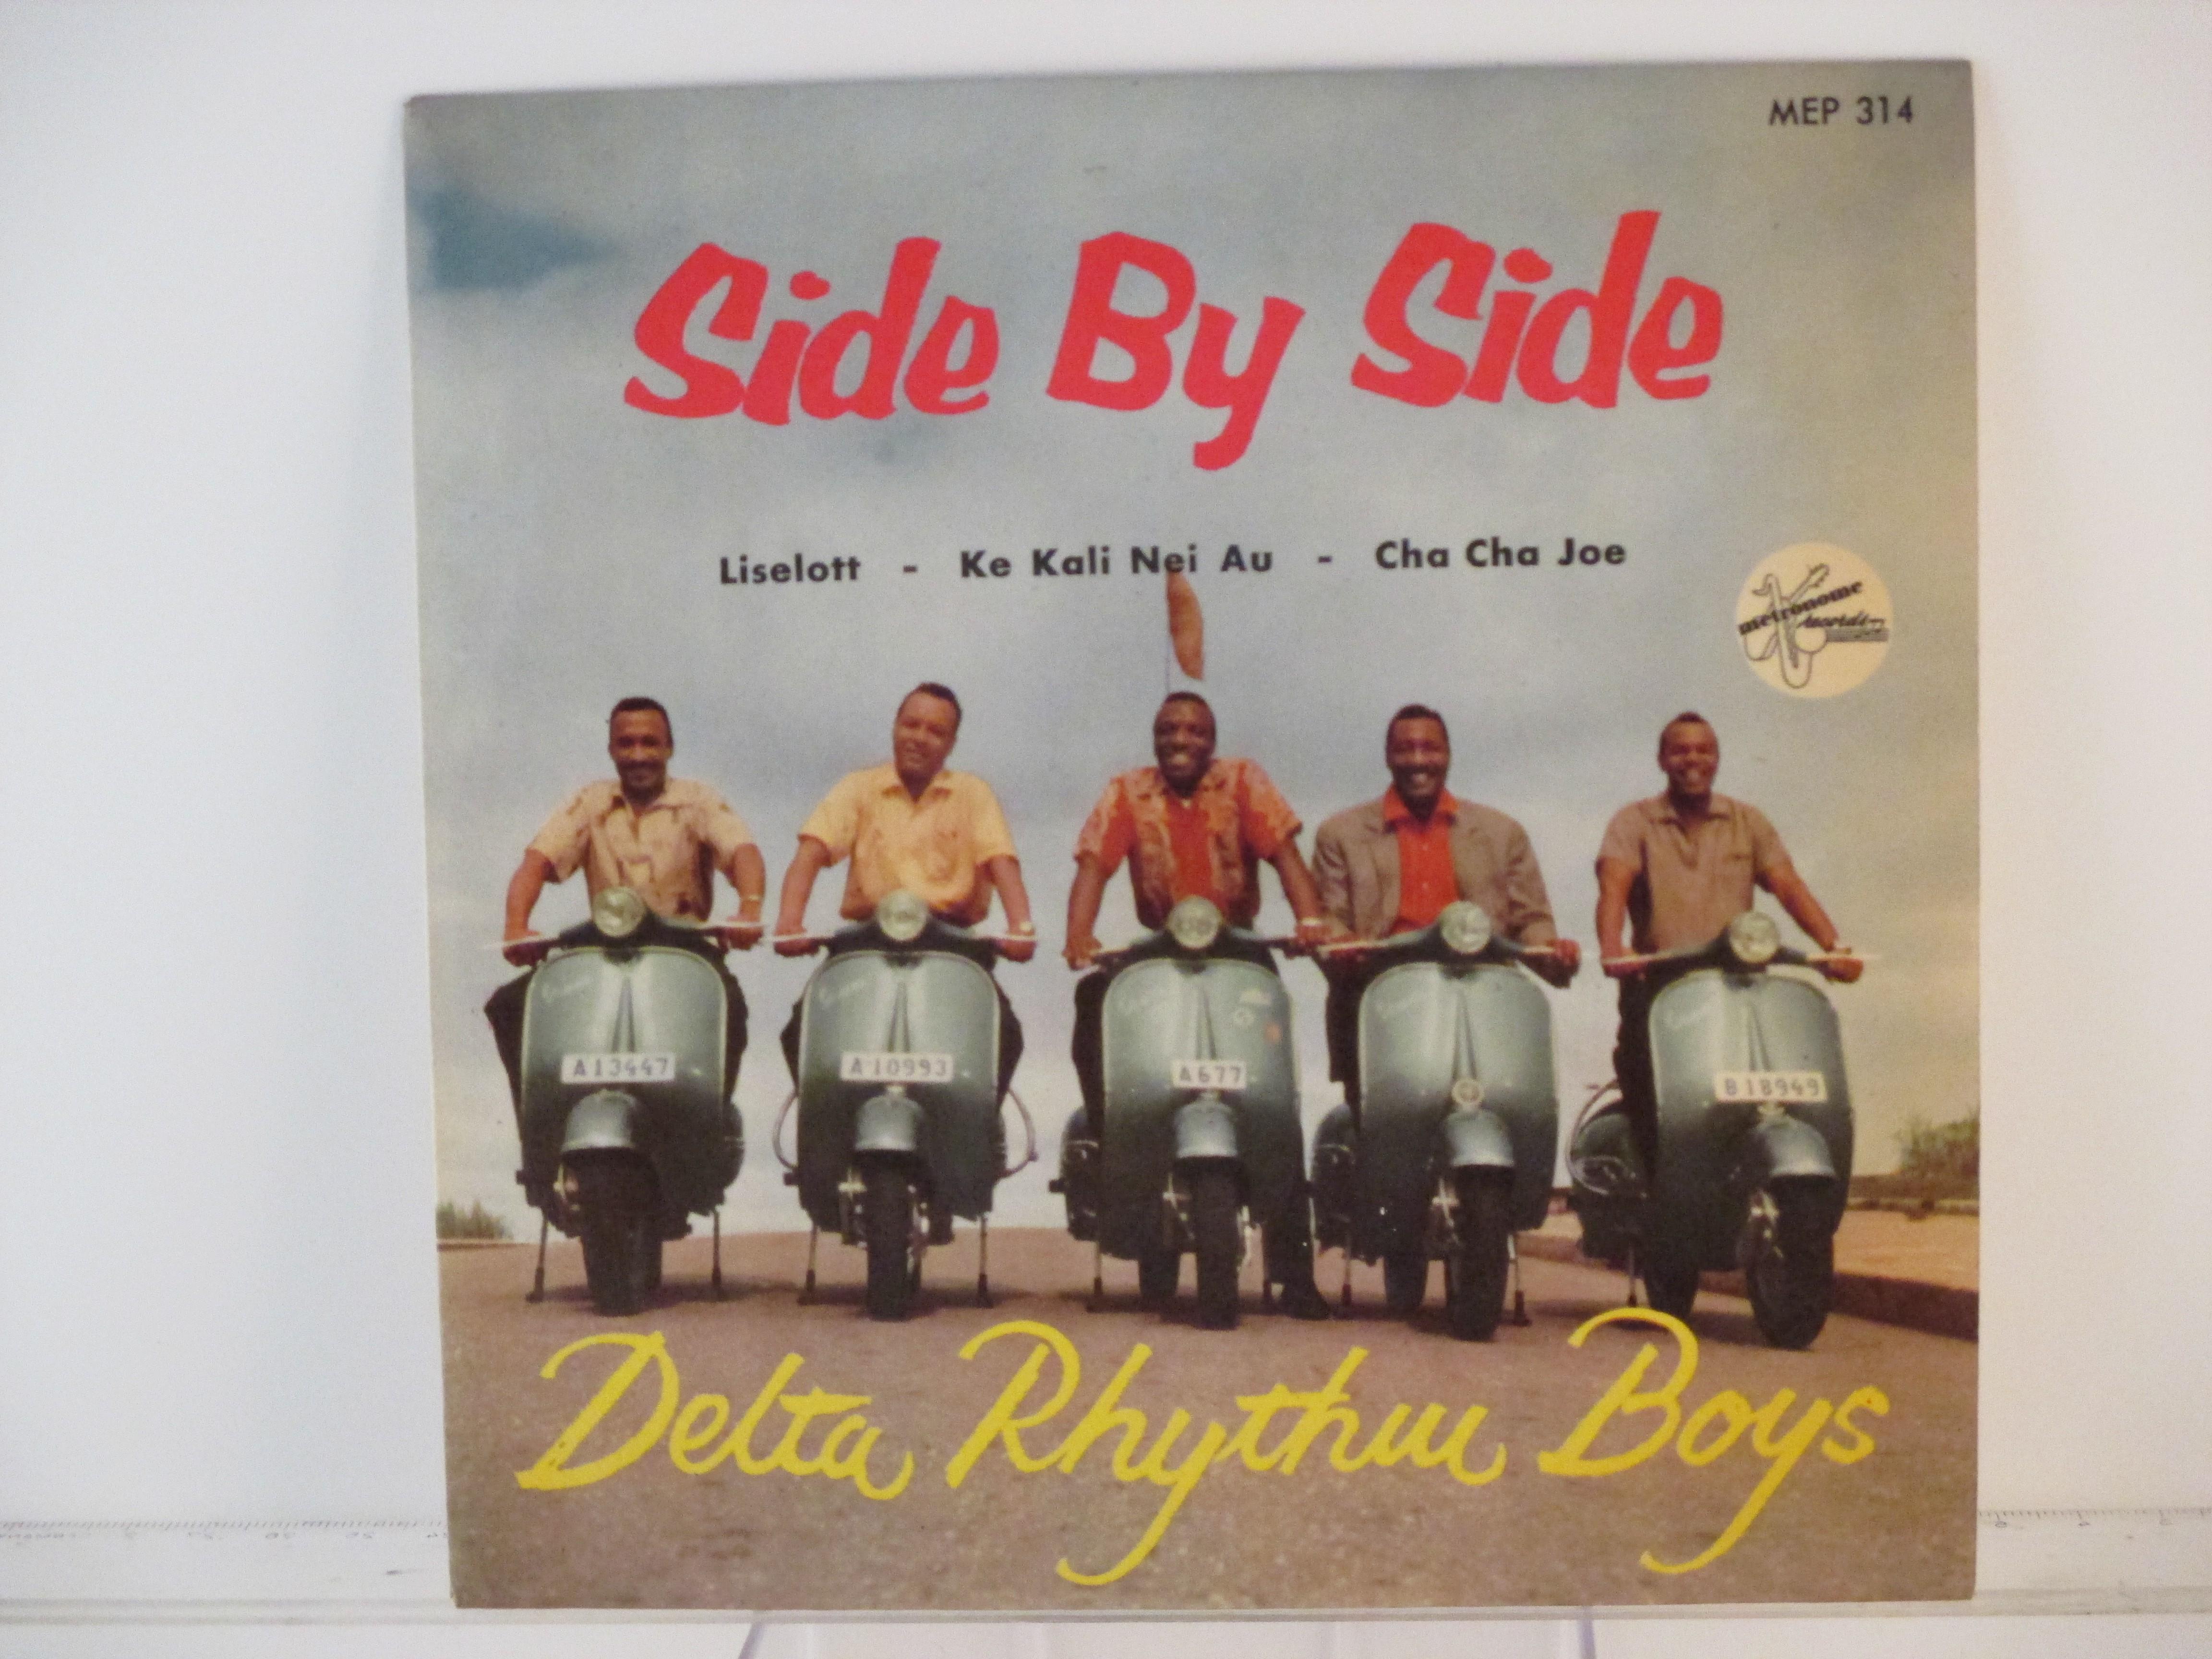 DELTA RHYTHM BOYS : (EP) Side by side / Liselott / Ke kali nei au / Cha cha Joe